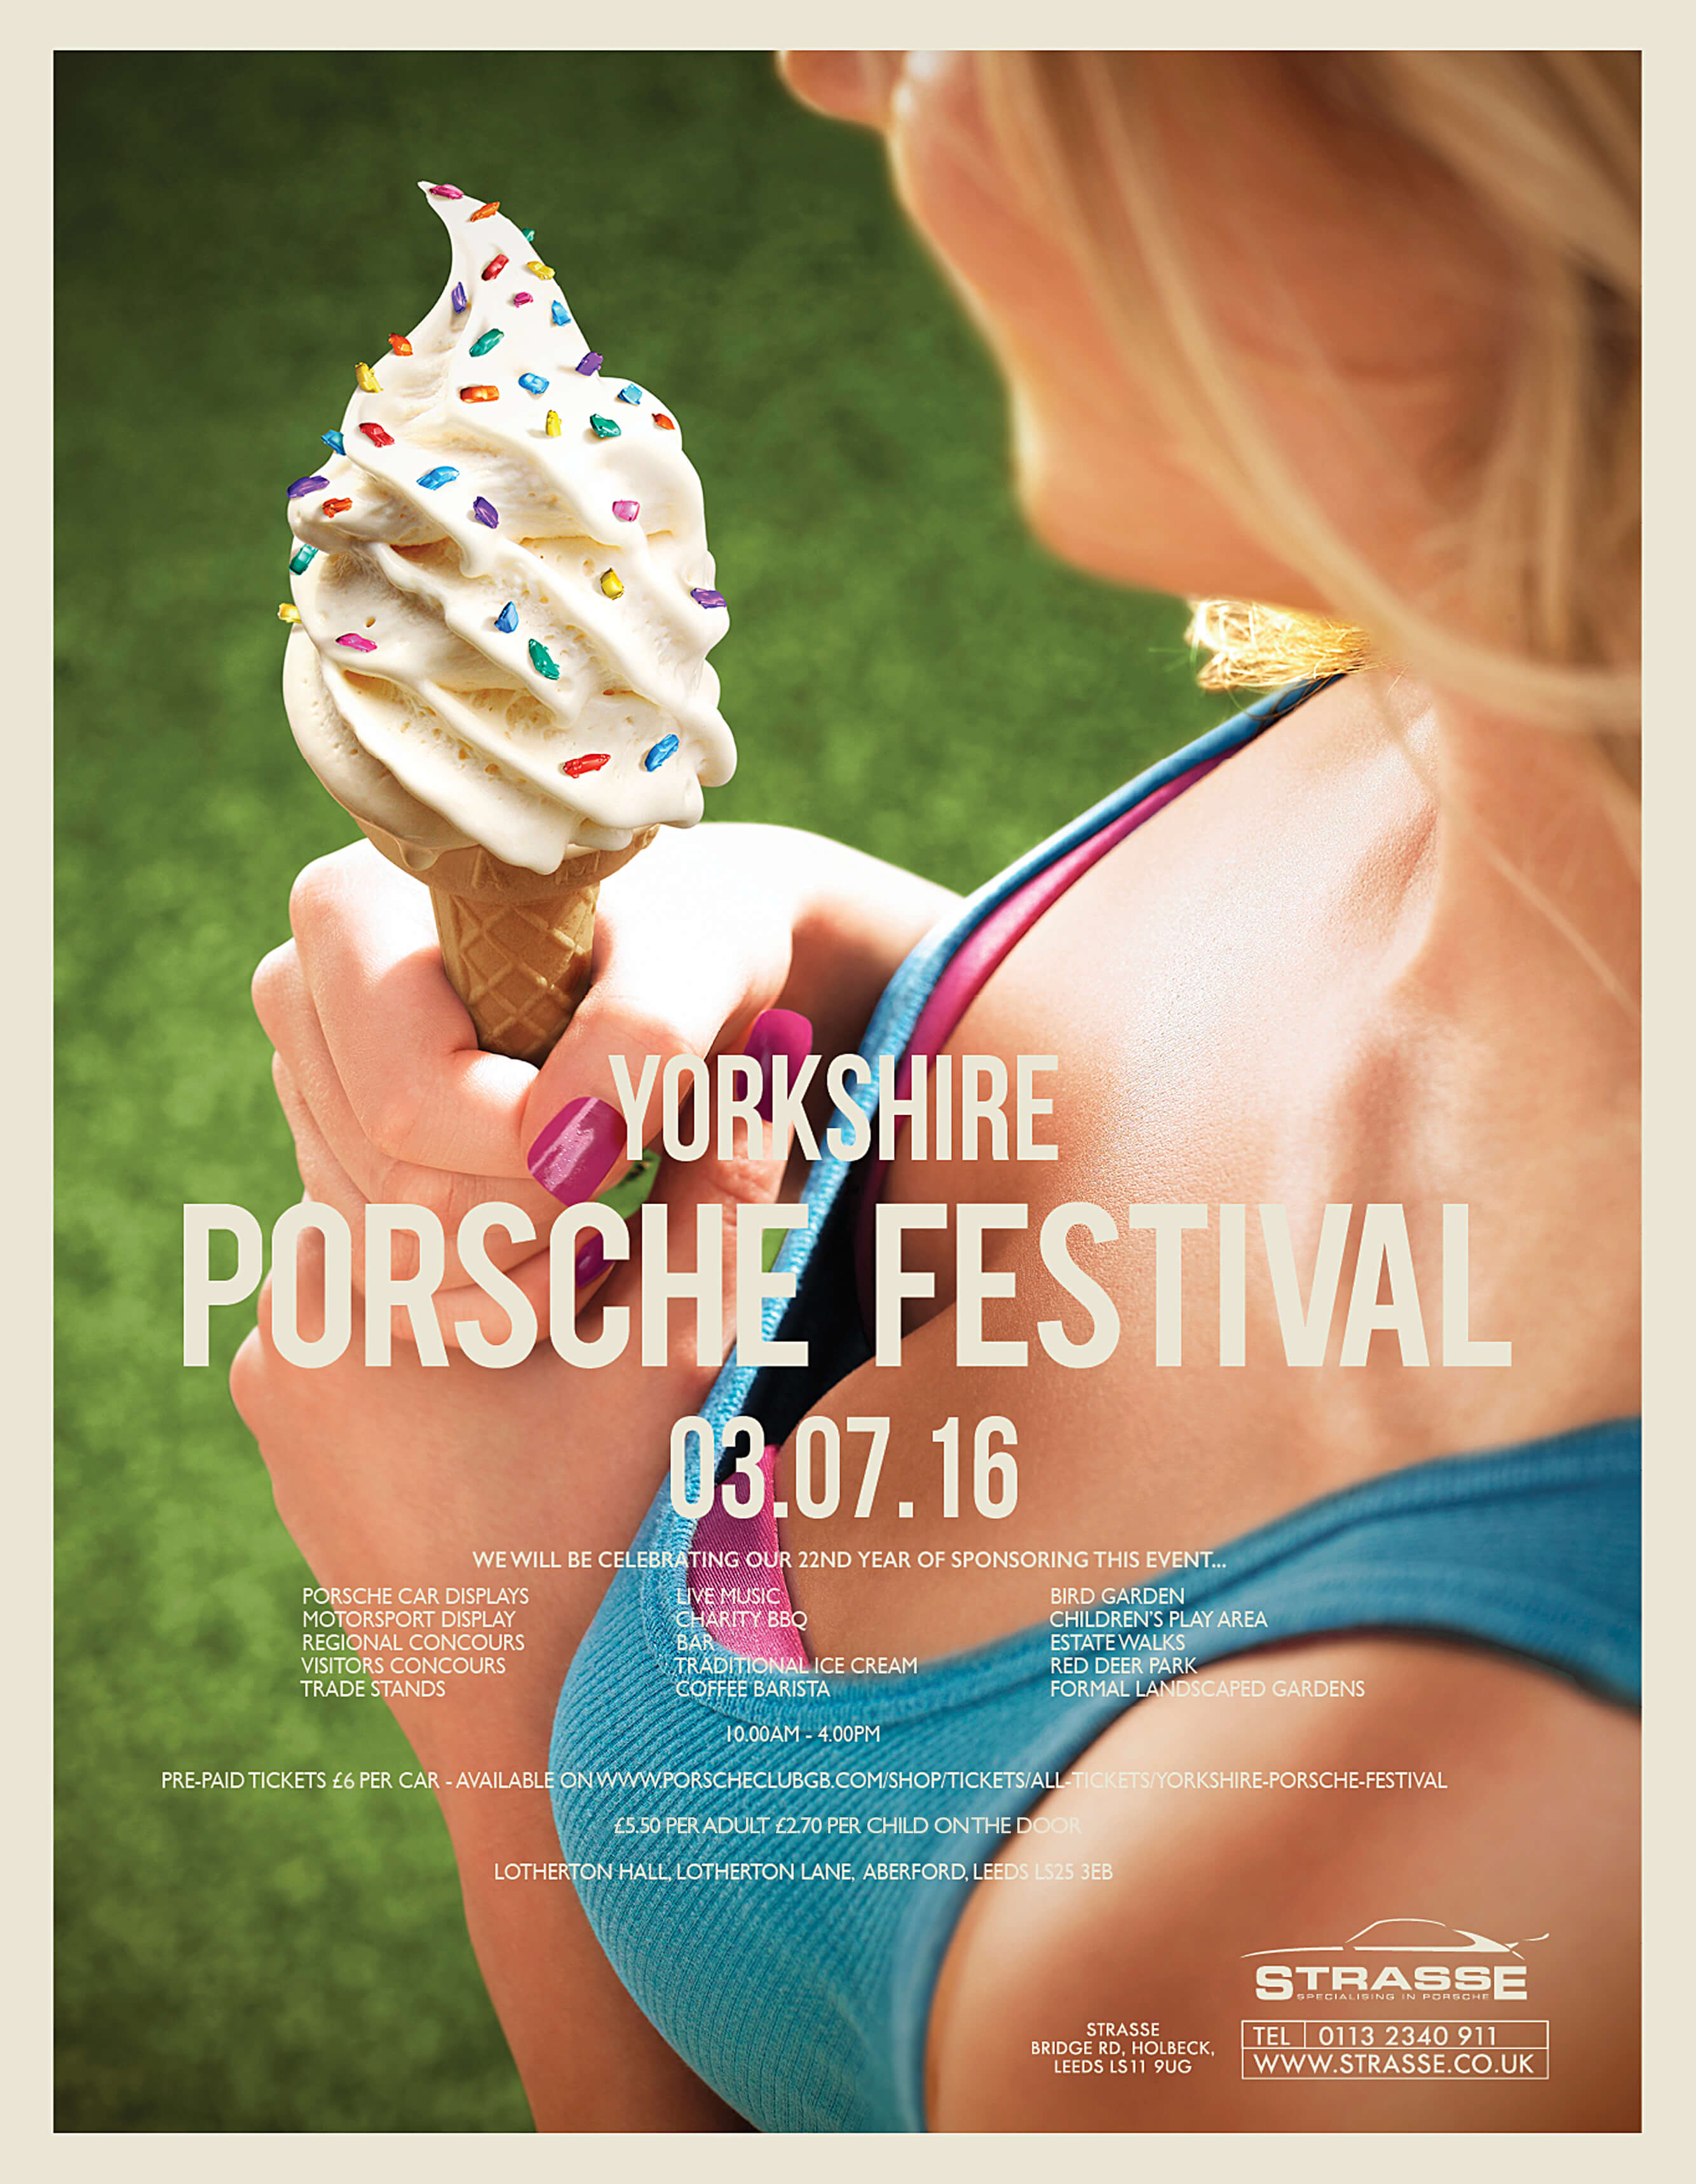 Yorkshire Porsche Festival 2016